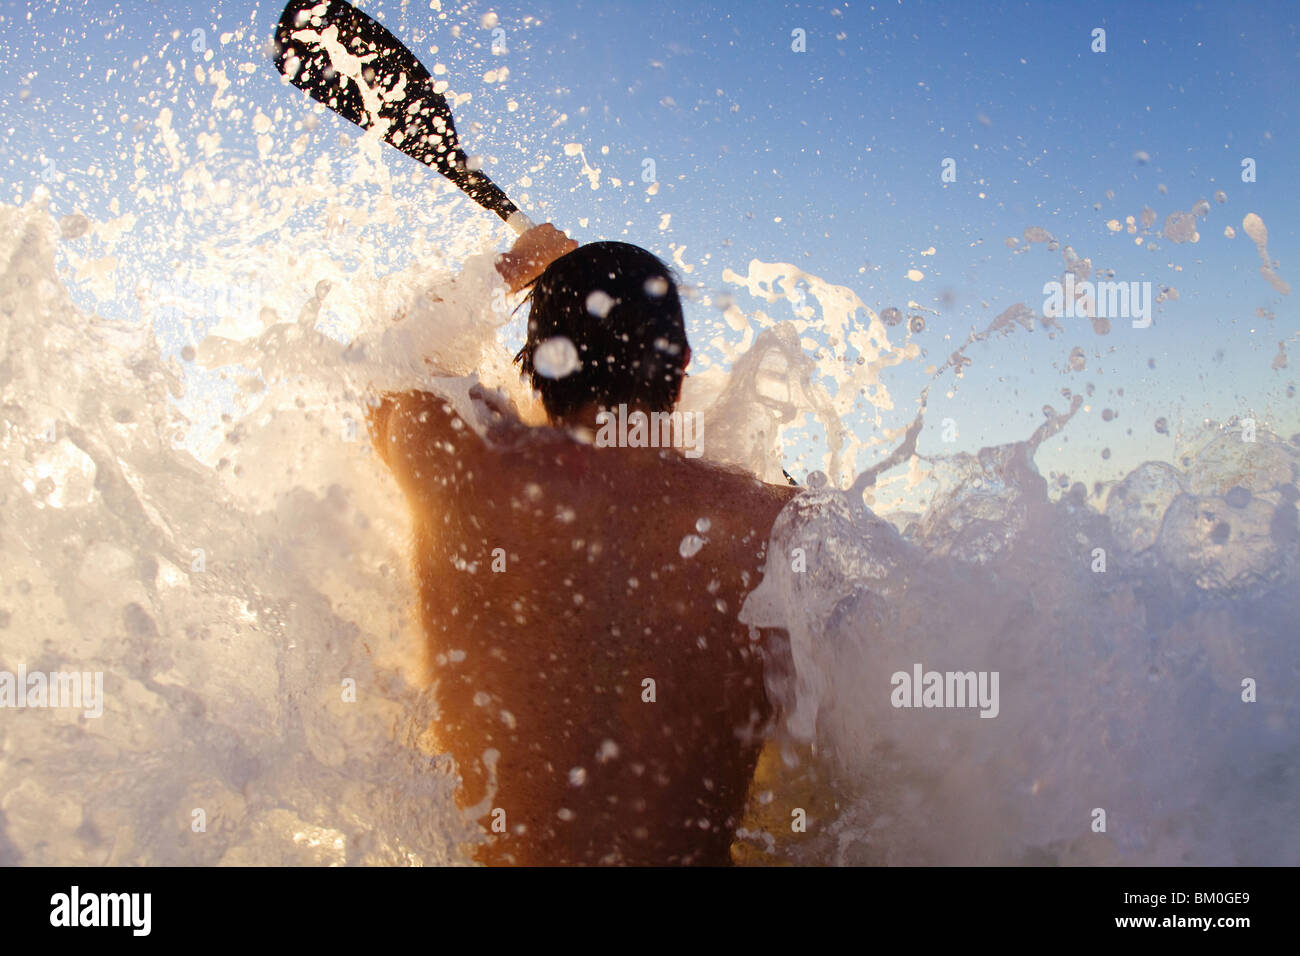 Giovane uomo kayak su onda elevata, Sun Coast Beach, Durban, KwaZulu-Natal, Sud Africa Foto Stock